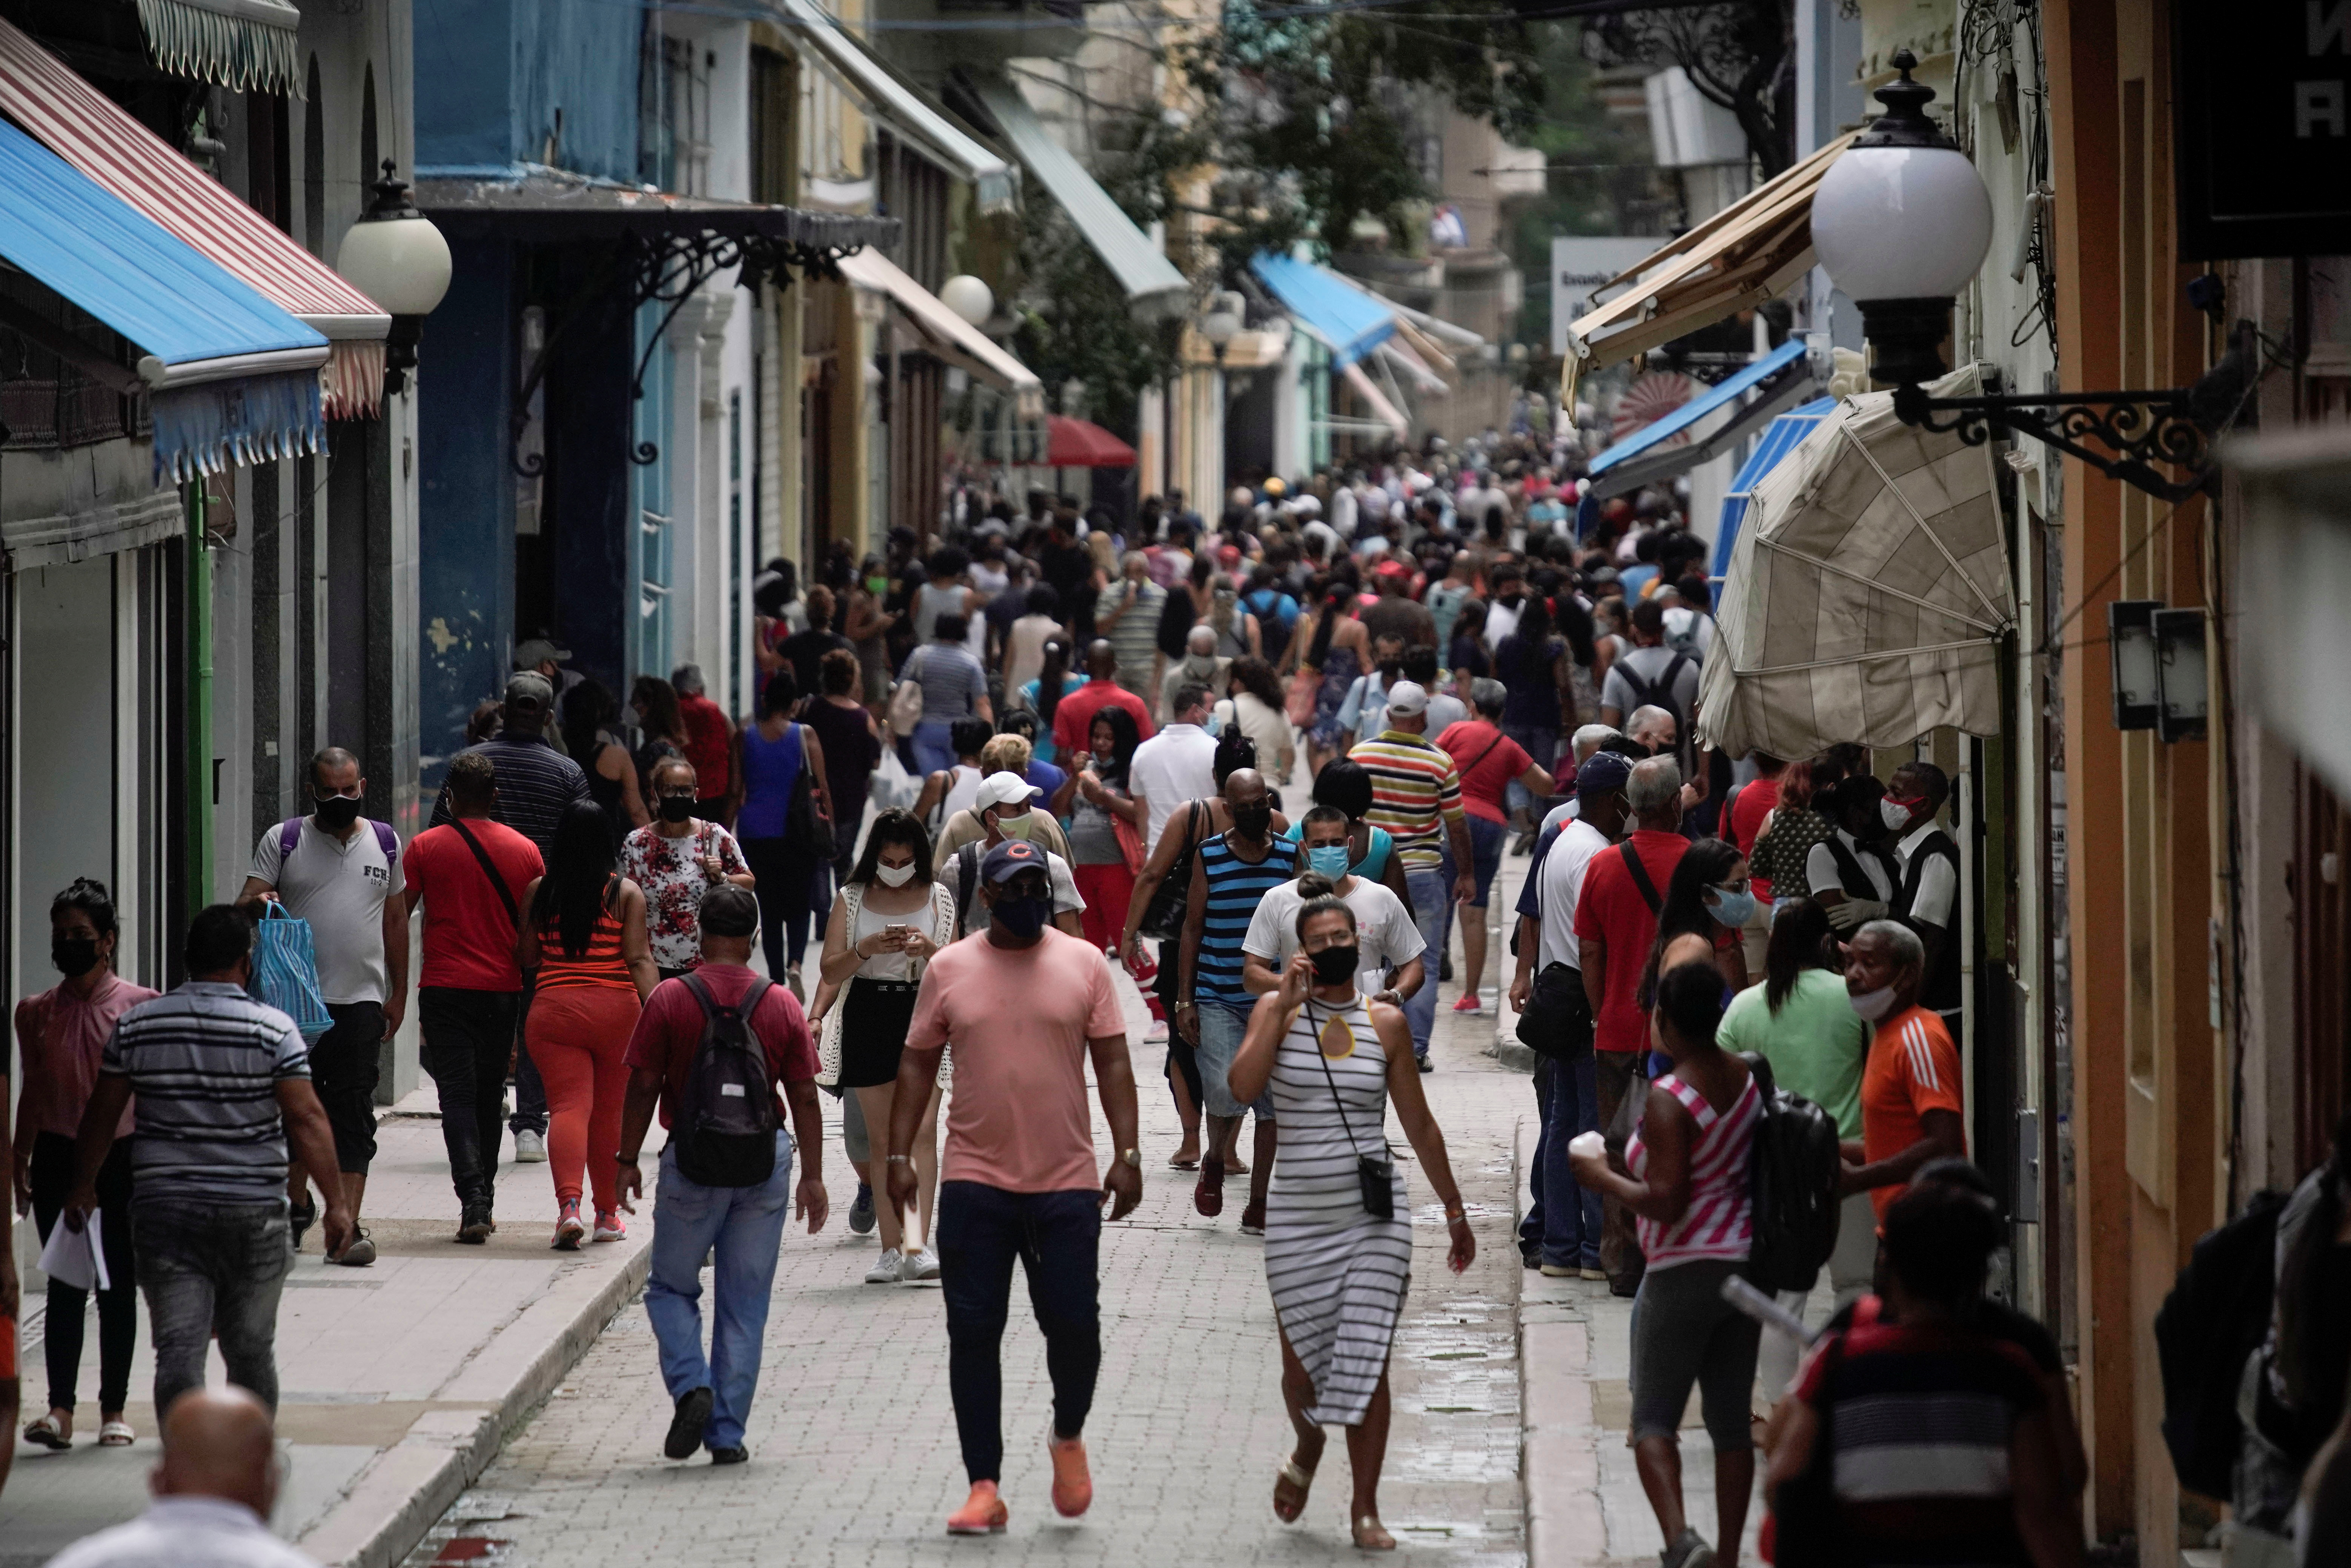 People walk in a commercial street amid the rise in cases of the coronavirus disease (COVID-19), in Havana, Cuba, June 15, 2021.  REUTERS/Alexandre Meneghini